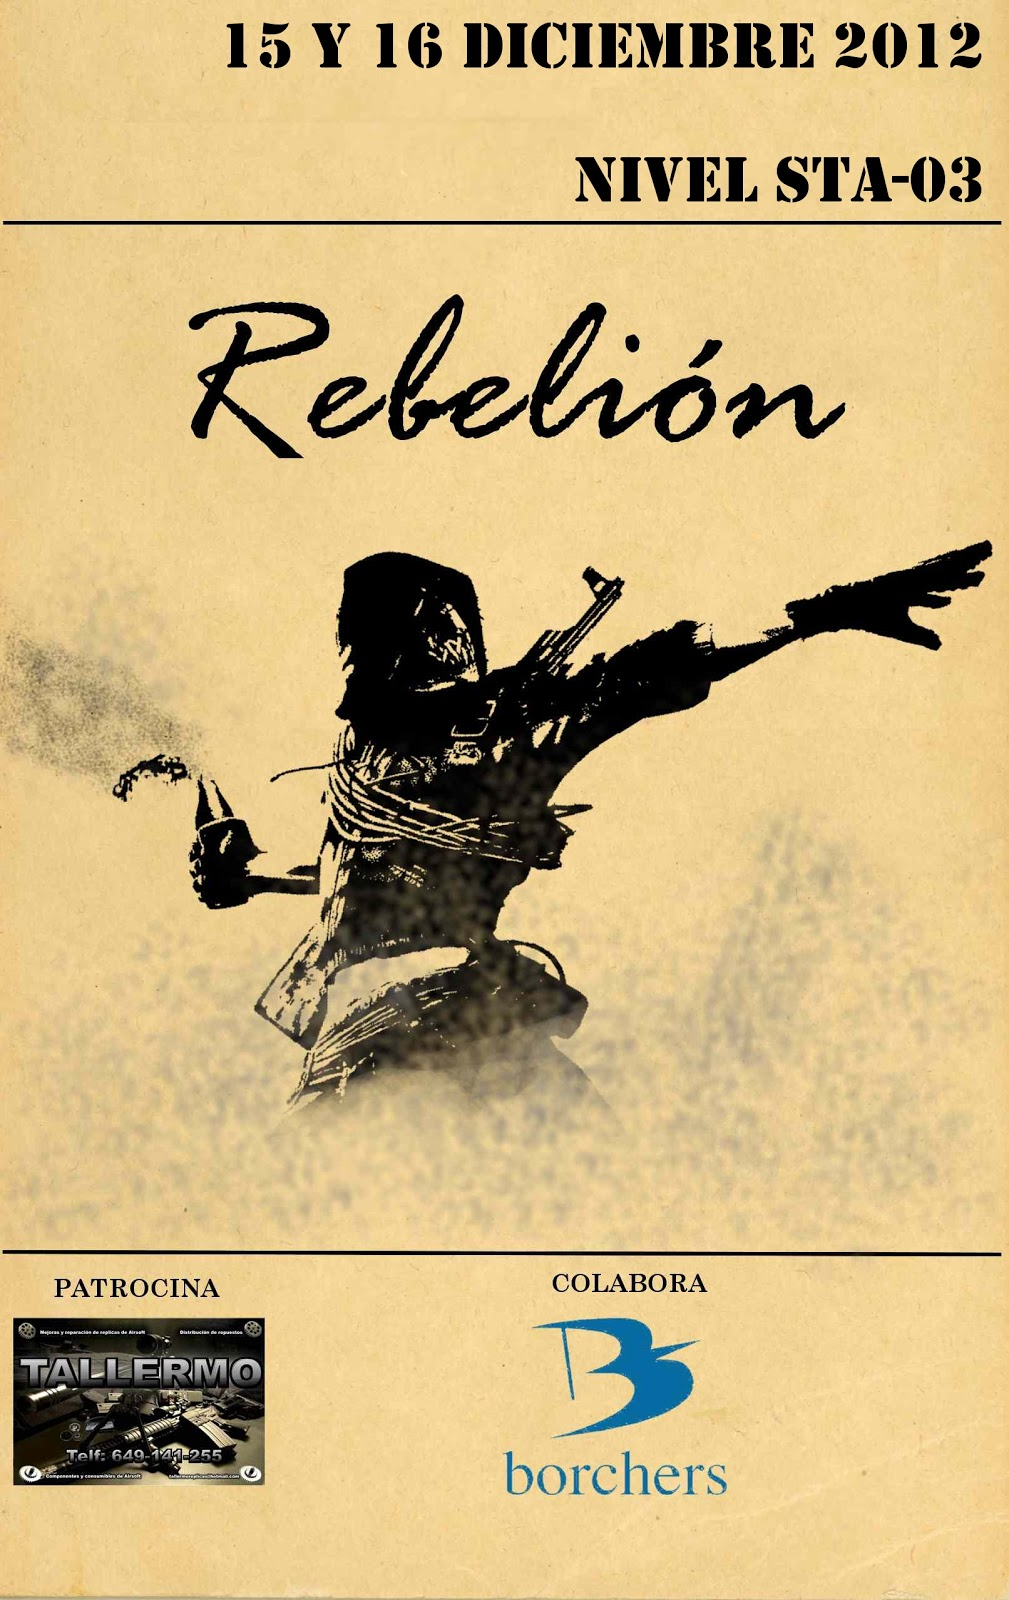 STA REBELIÓN  15/16 DIC 2012 Rebelion